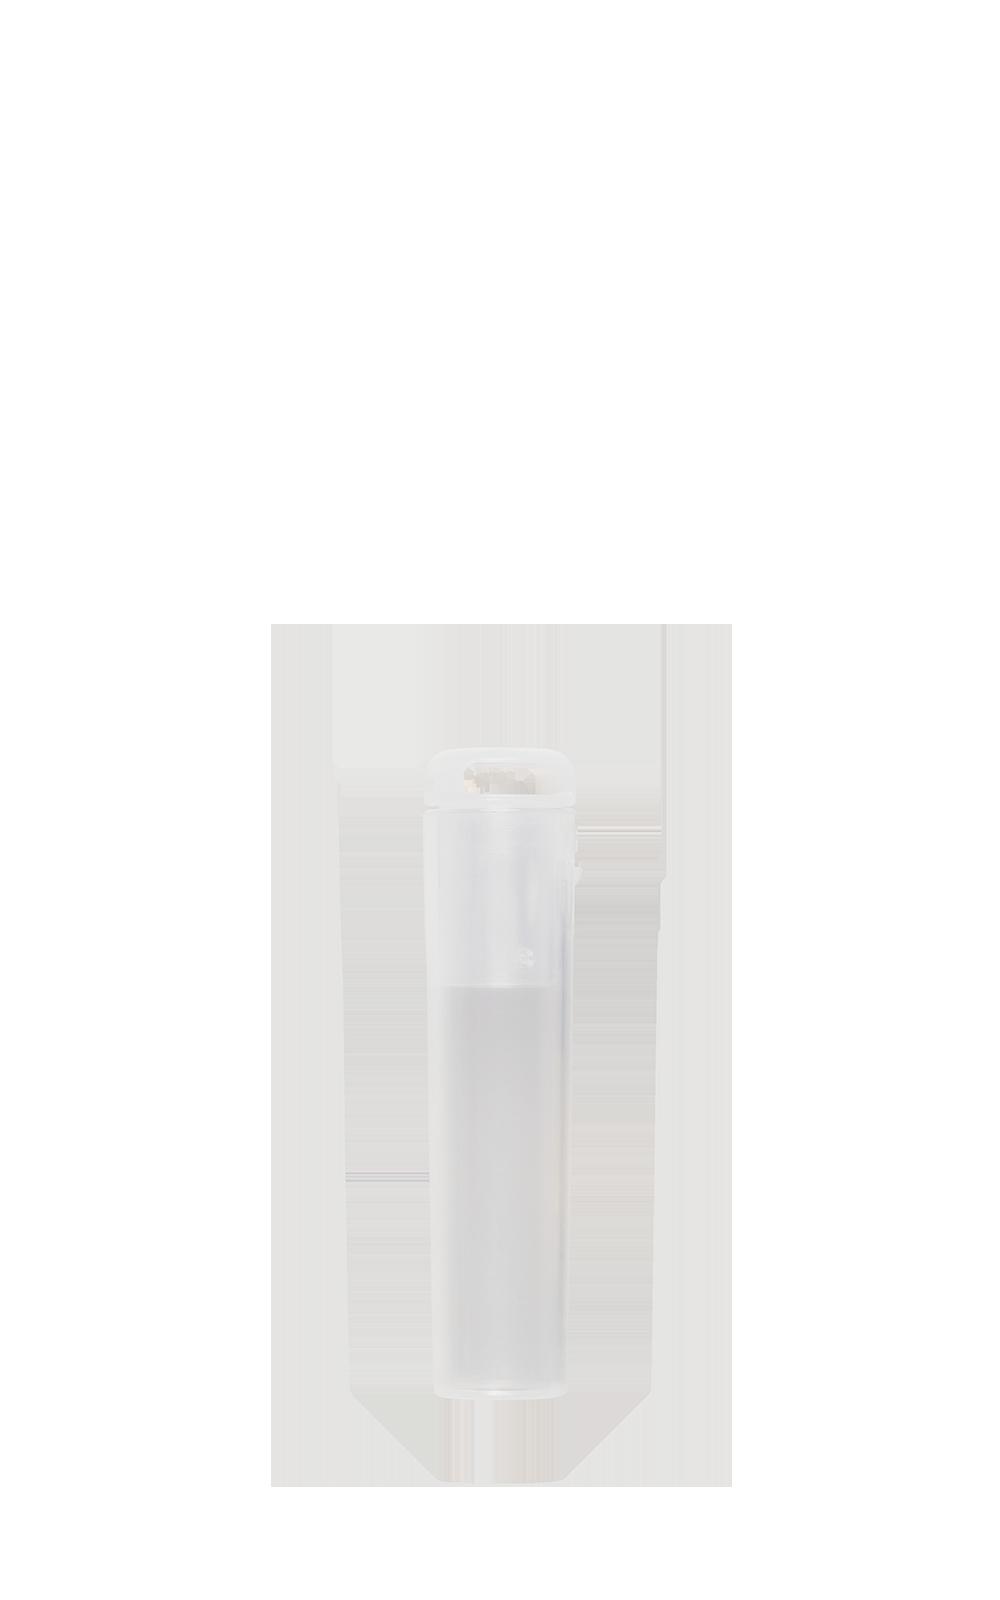 crpak-tube-70-Side-Empty.png